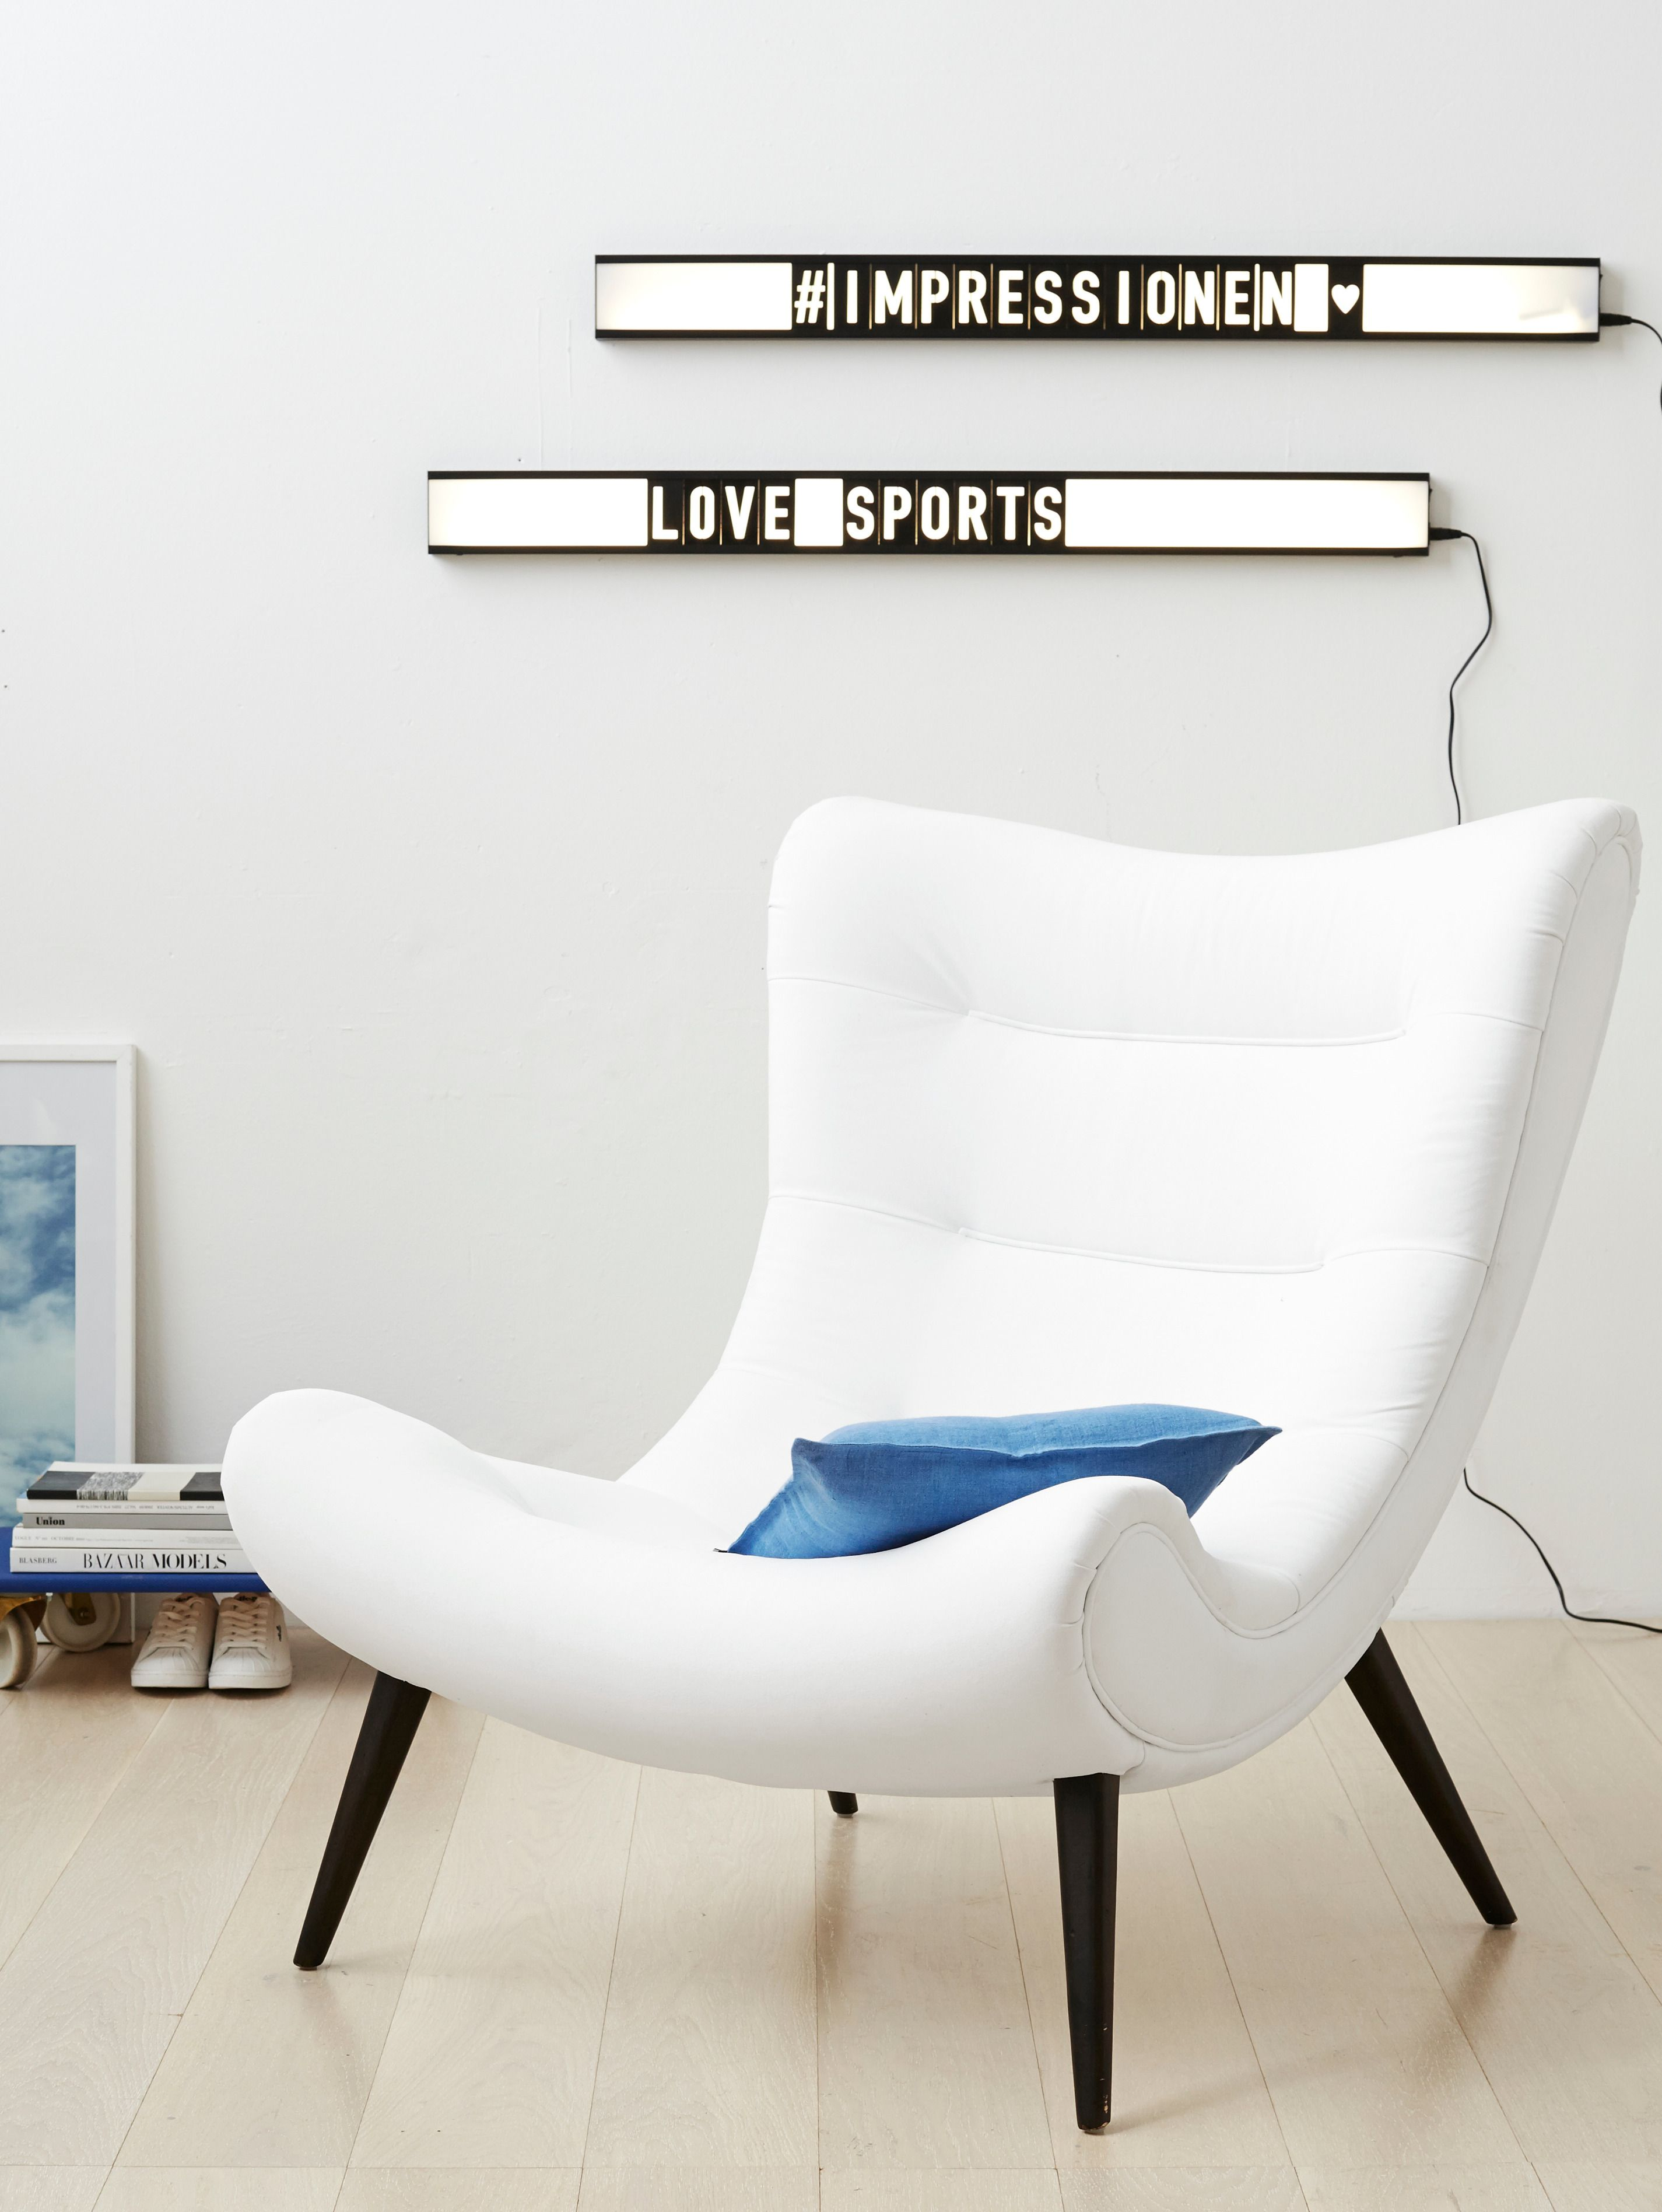 Impressionen Living Design Sessel Impressionen Sessel